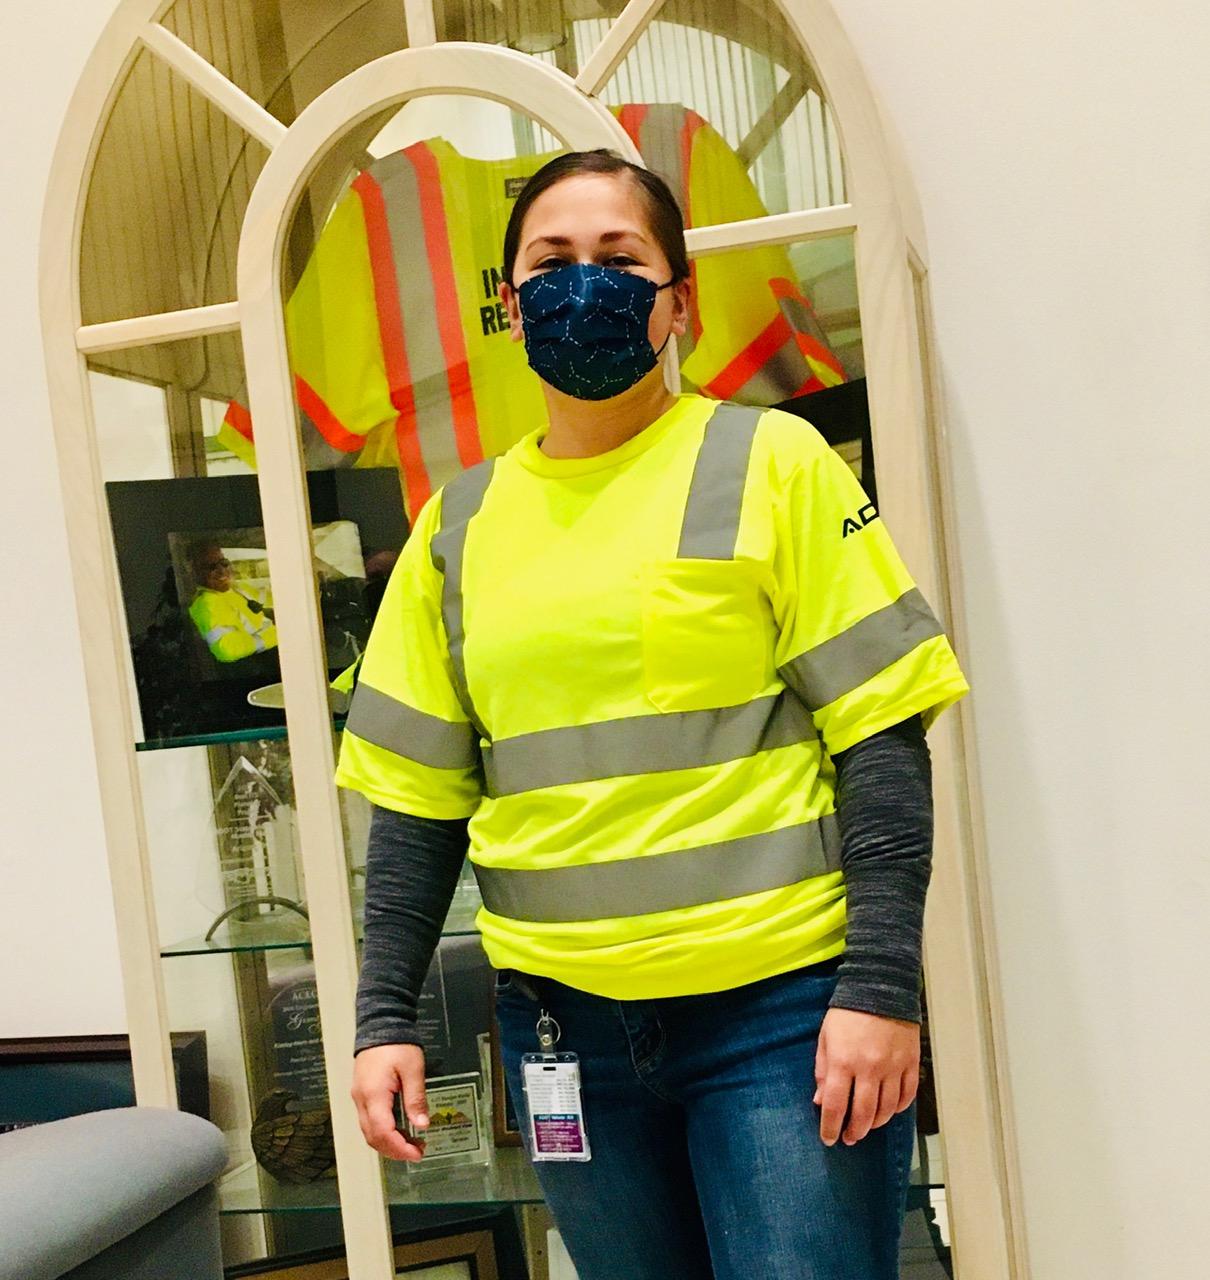 Jasmine Arollo starts her new job with the Incident Response Unit